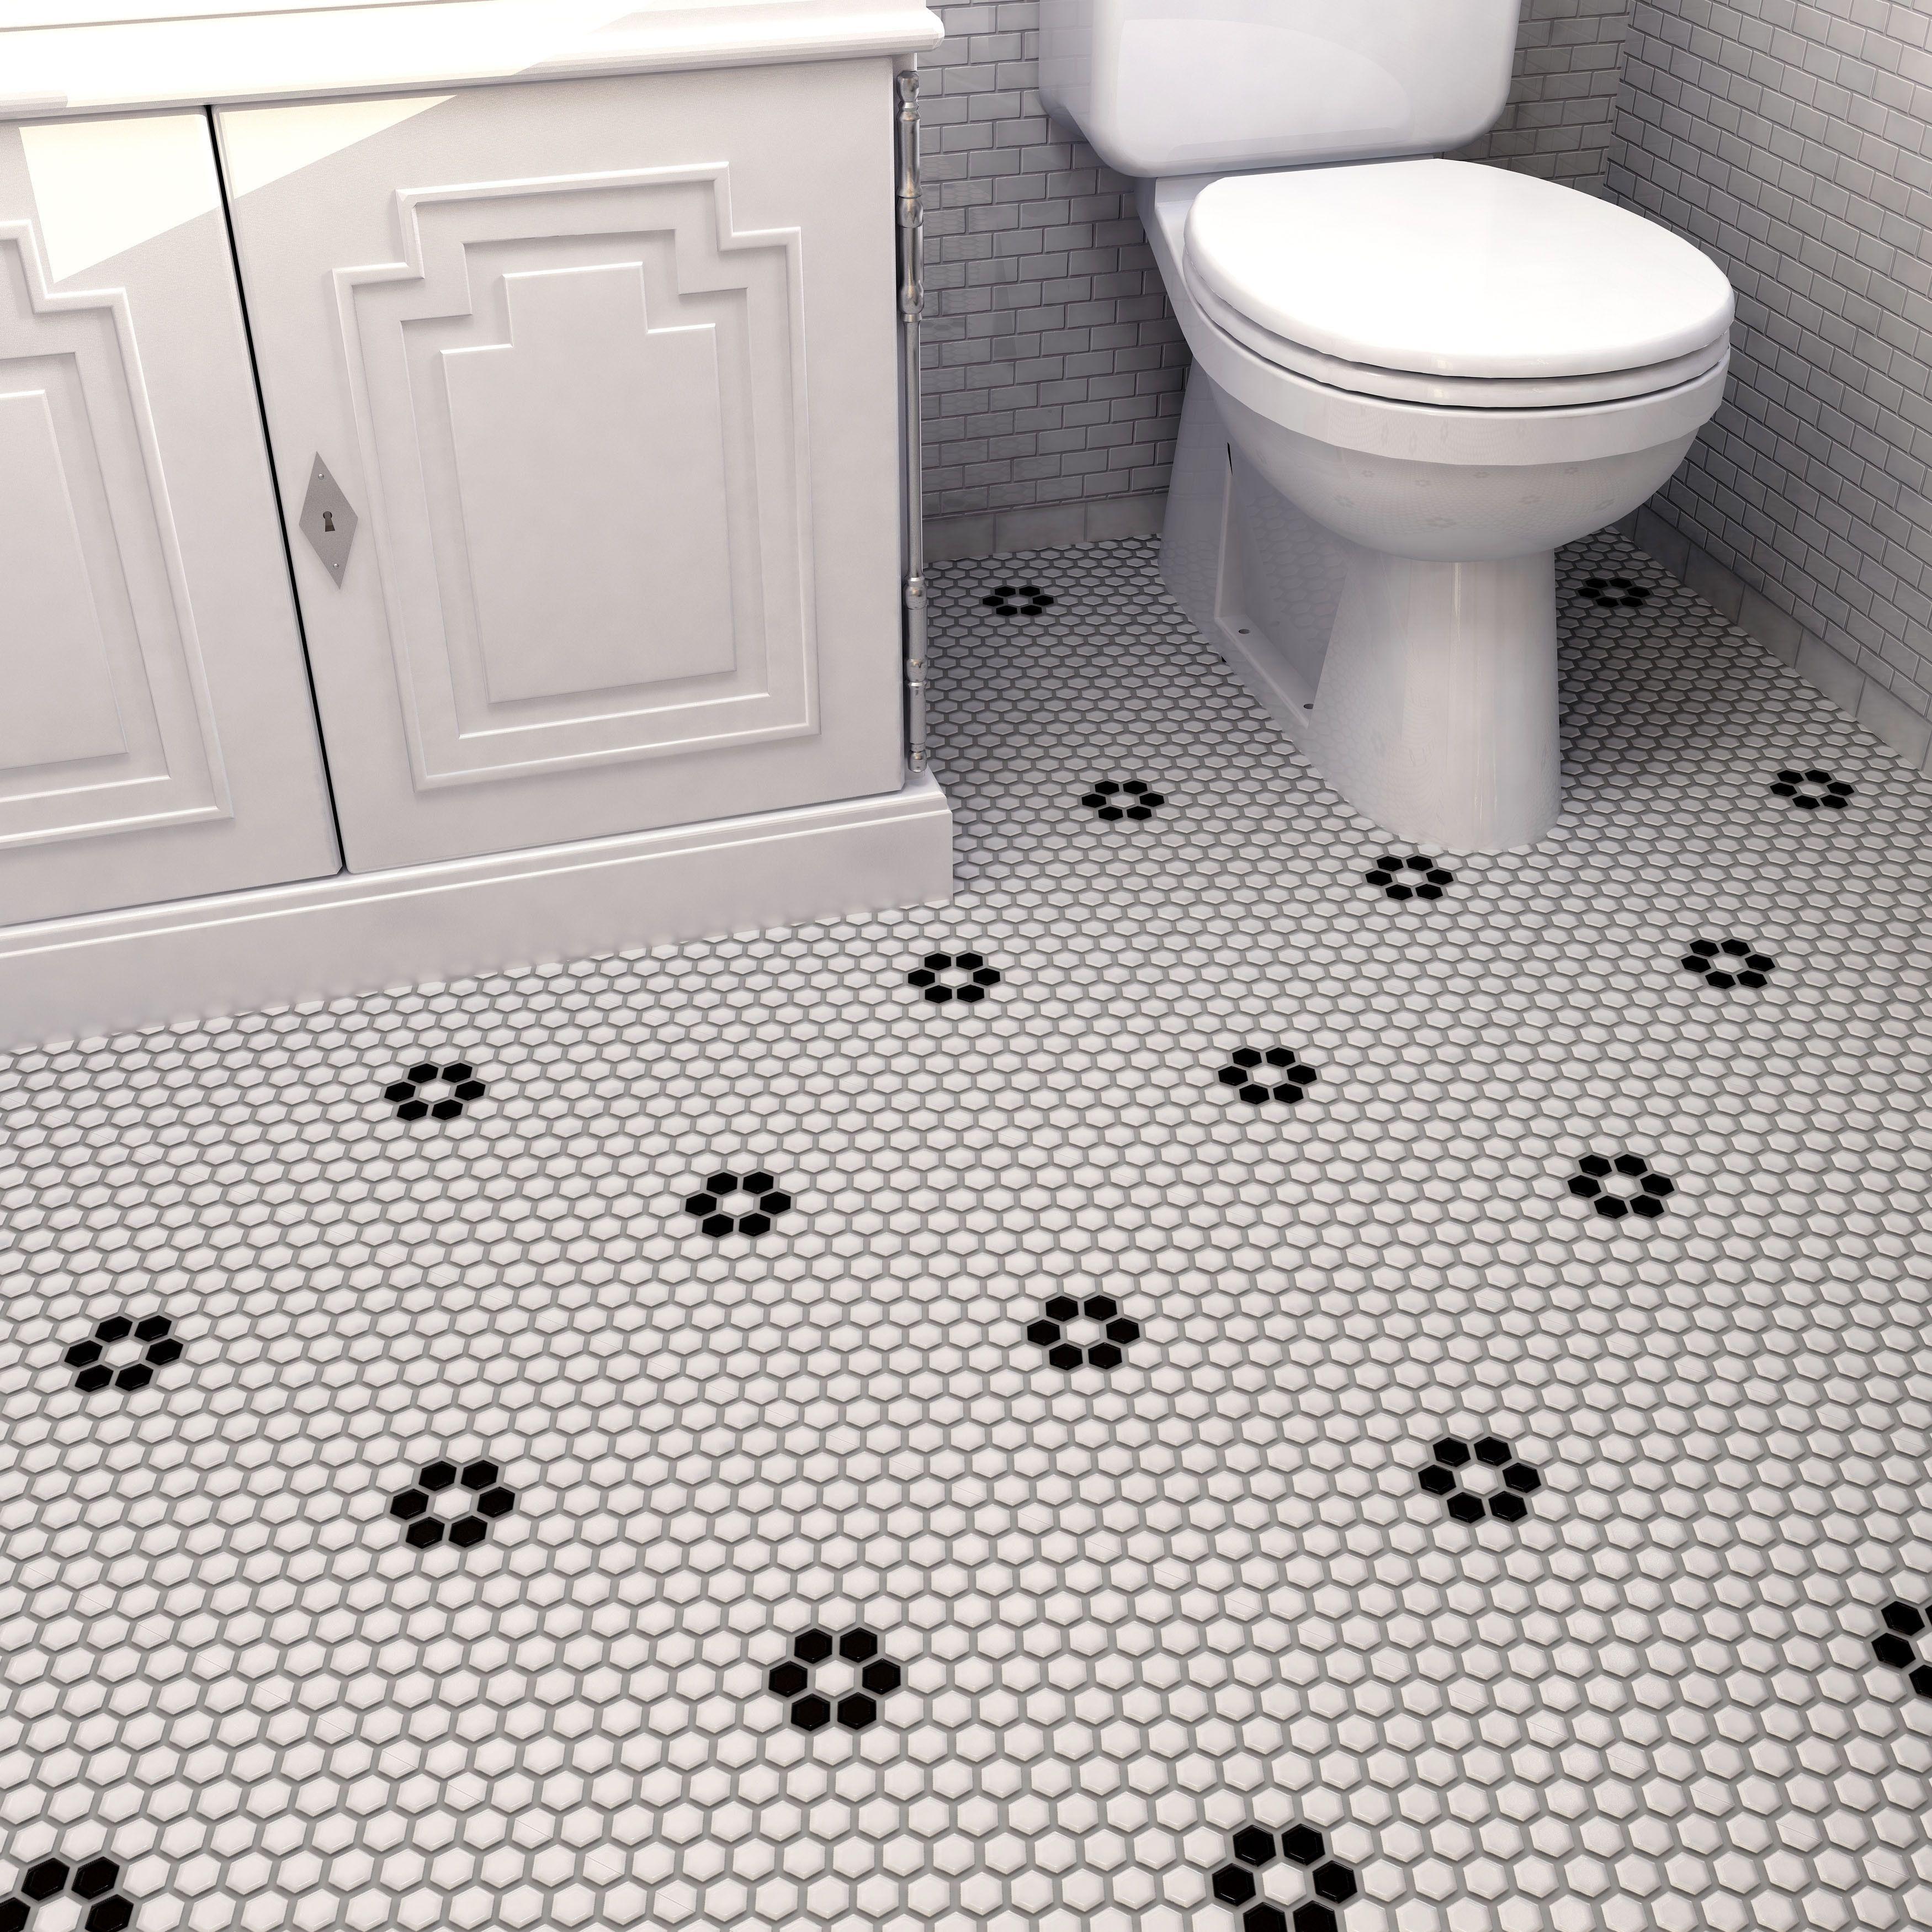 Elitetile Retro Hexagon 0 875 X 0 875 Porcelain Mosaic Tile In Glazed White Black Mosaic Flooring Wall Tiles Flooring